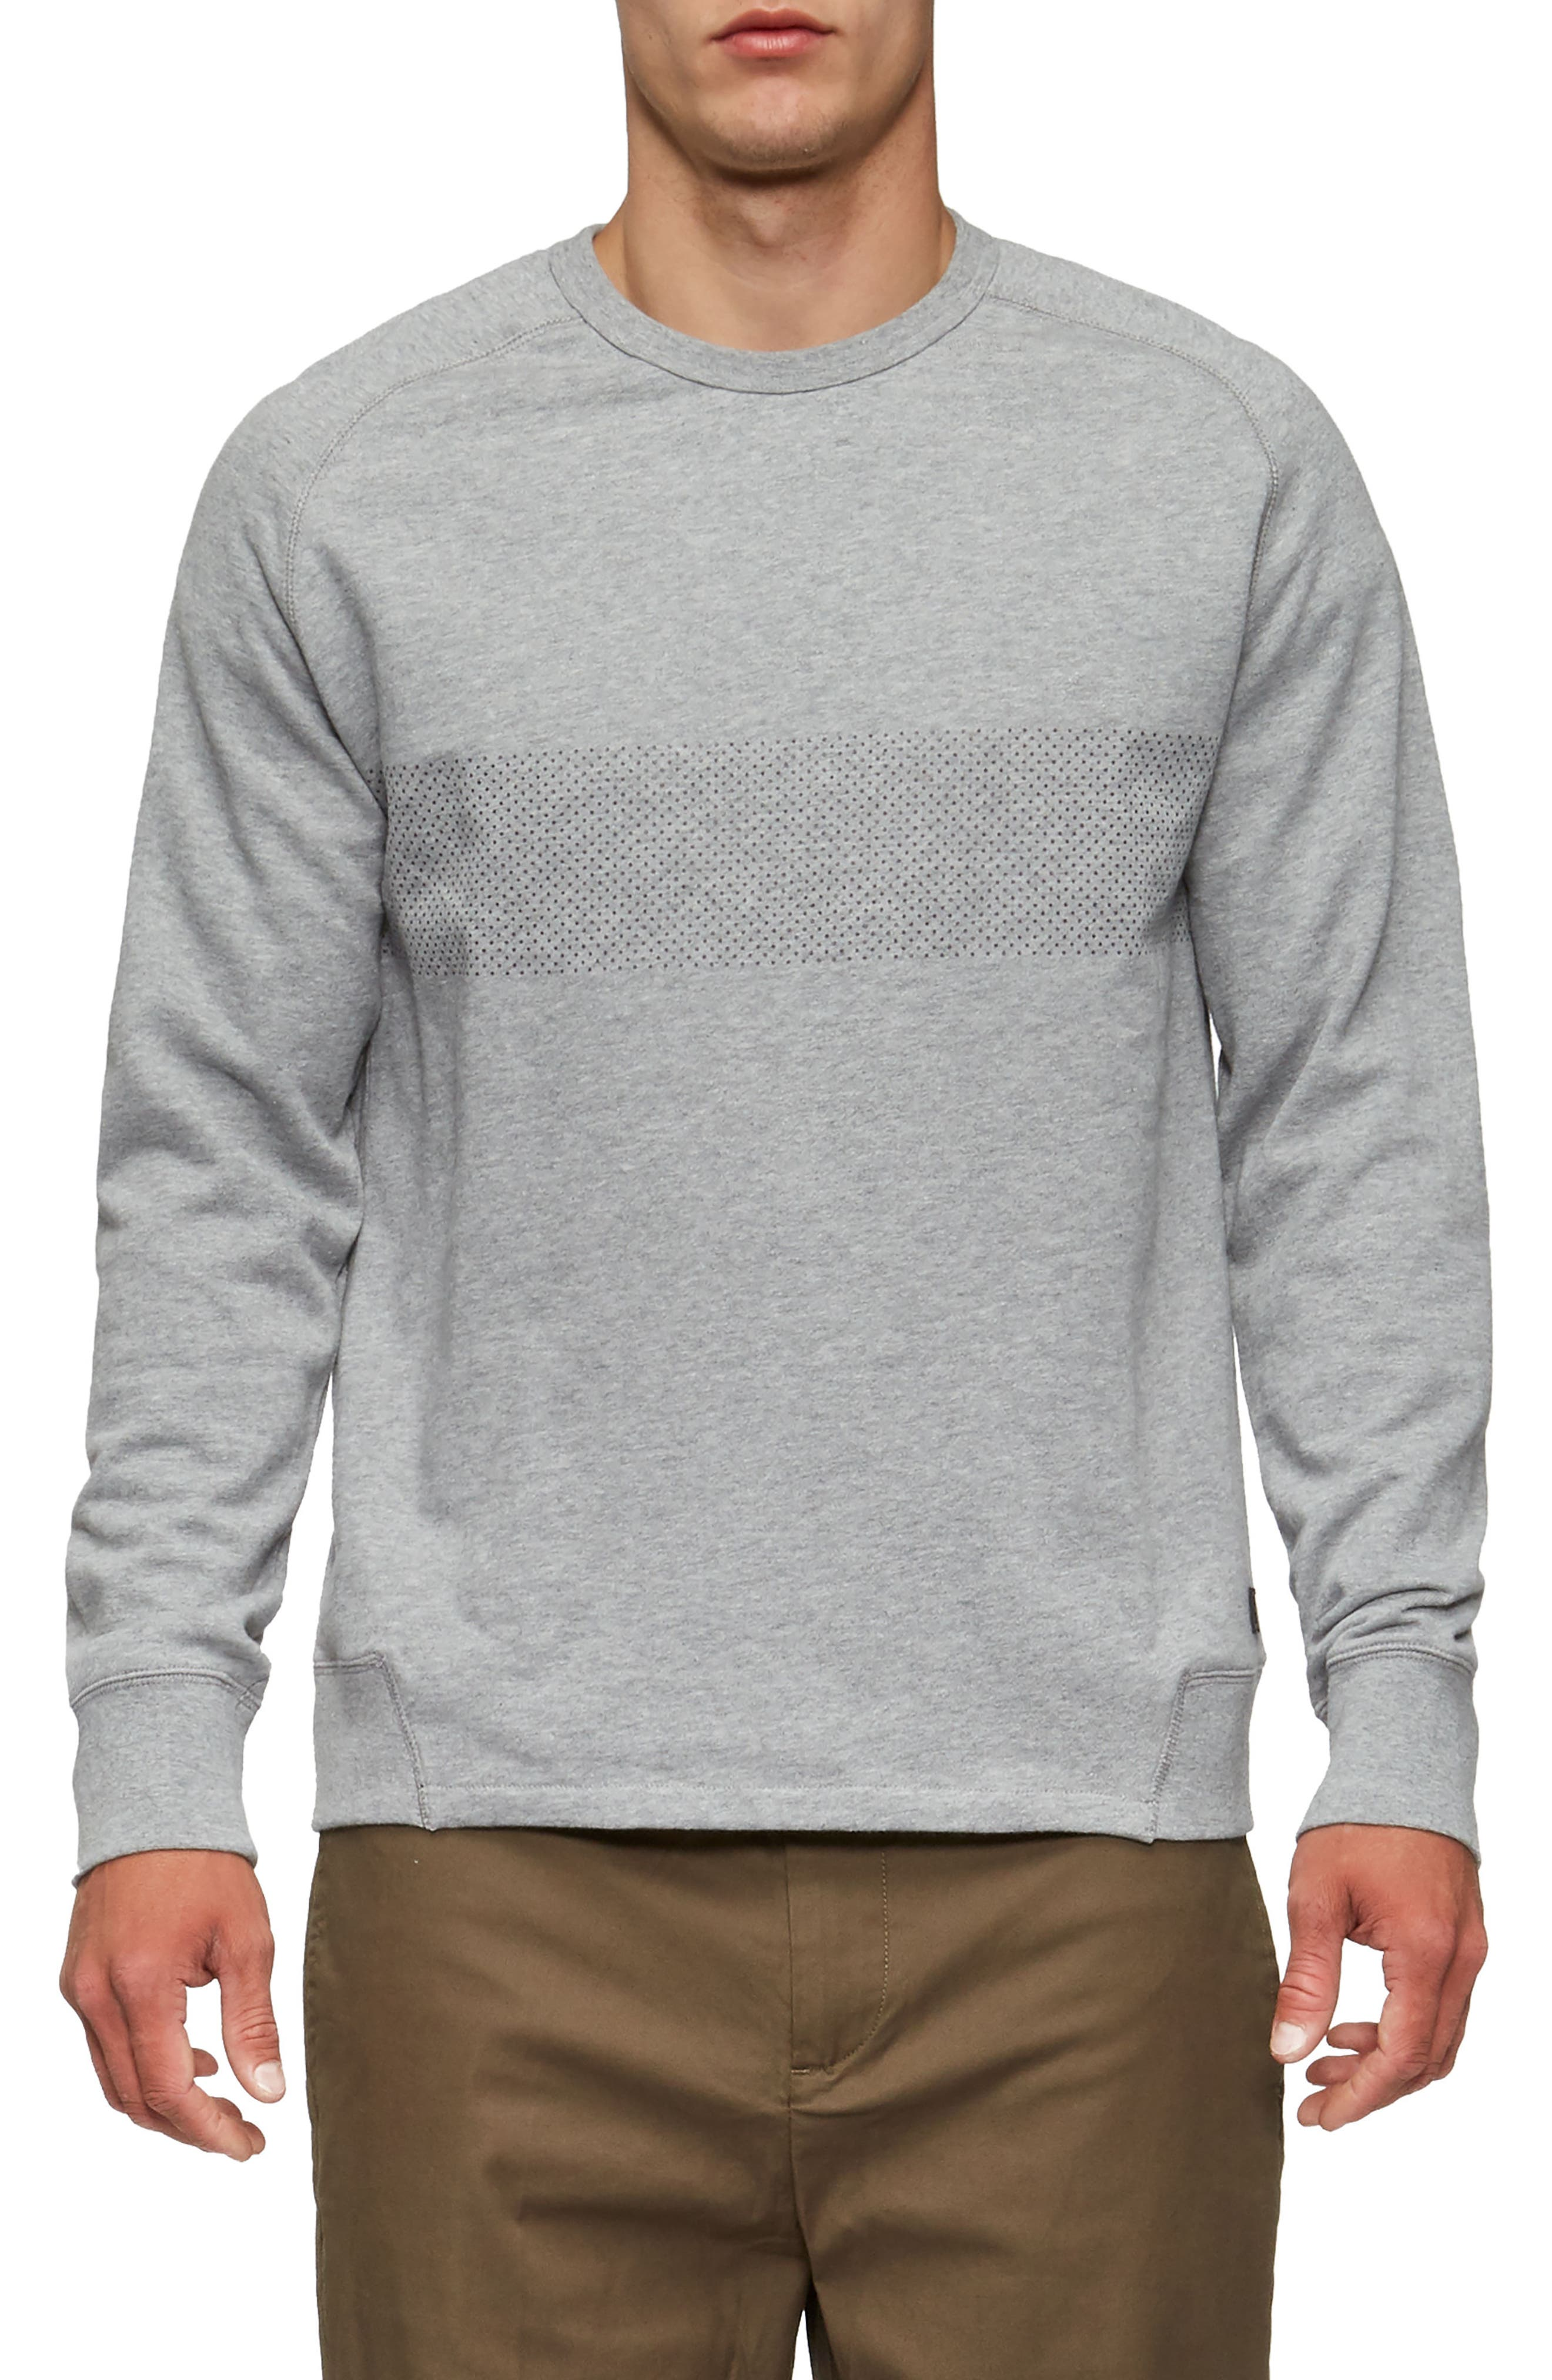 TRAVIK Stafford Crewneck Sweatshirt